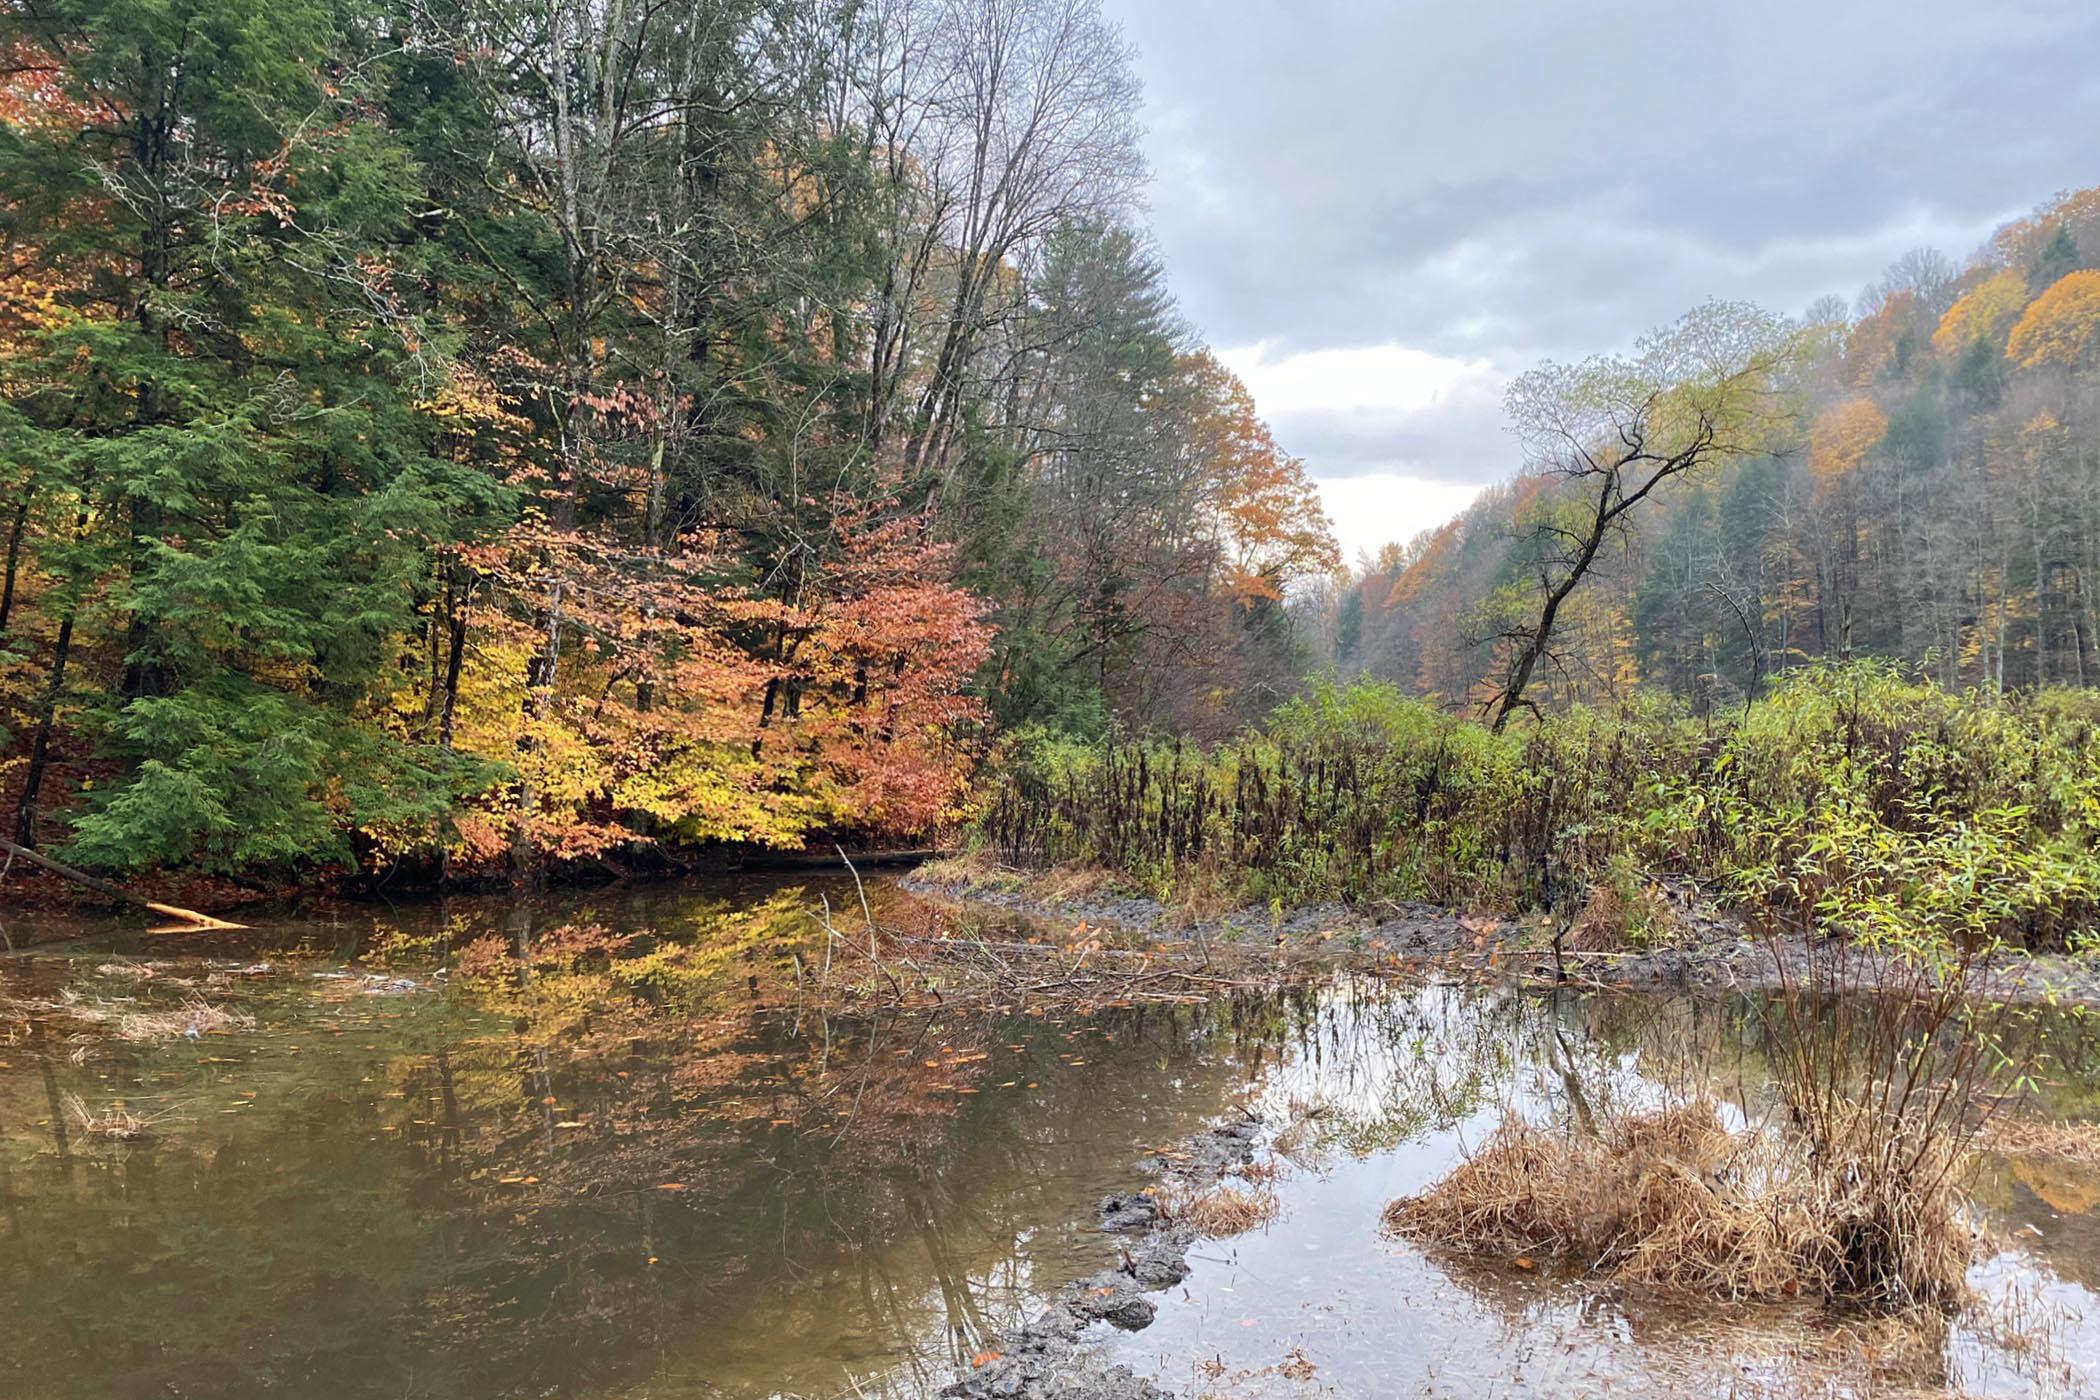 Shindagin Hollow wetland after rain.